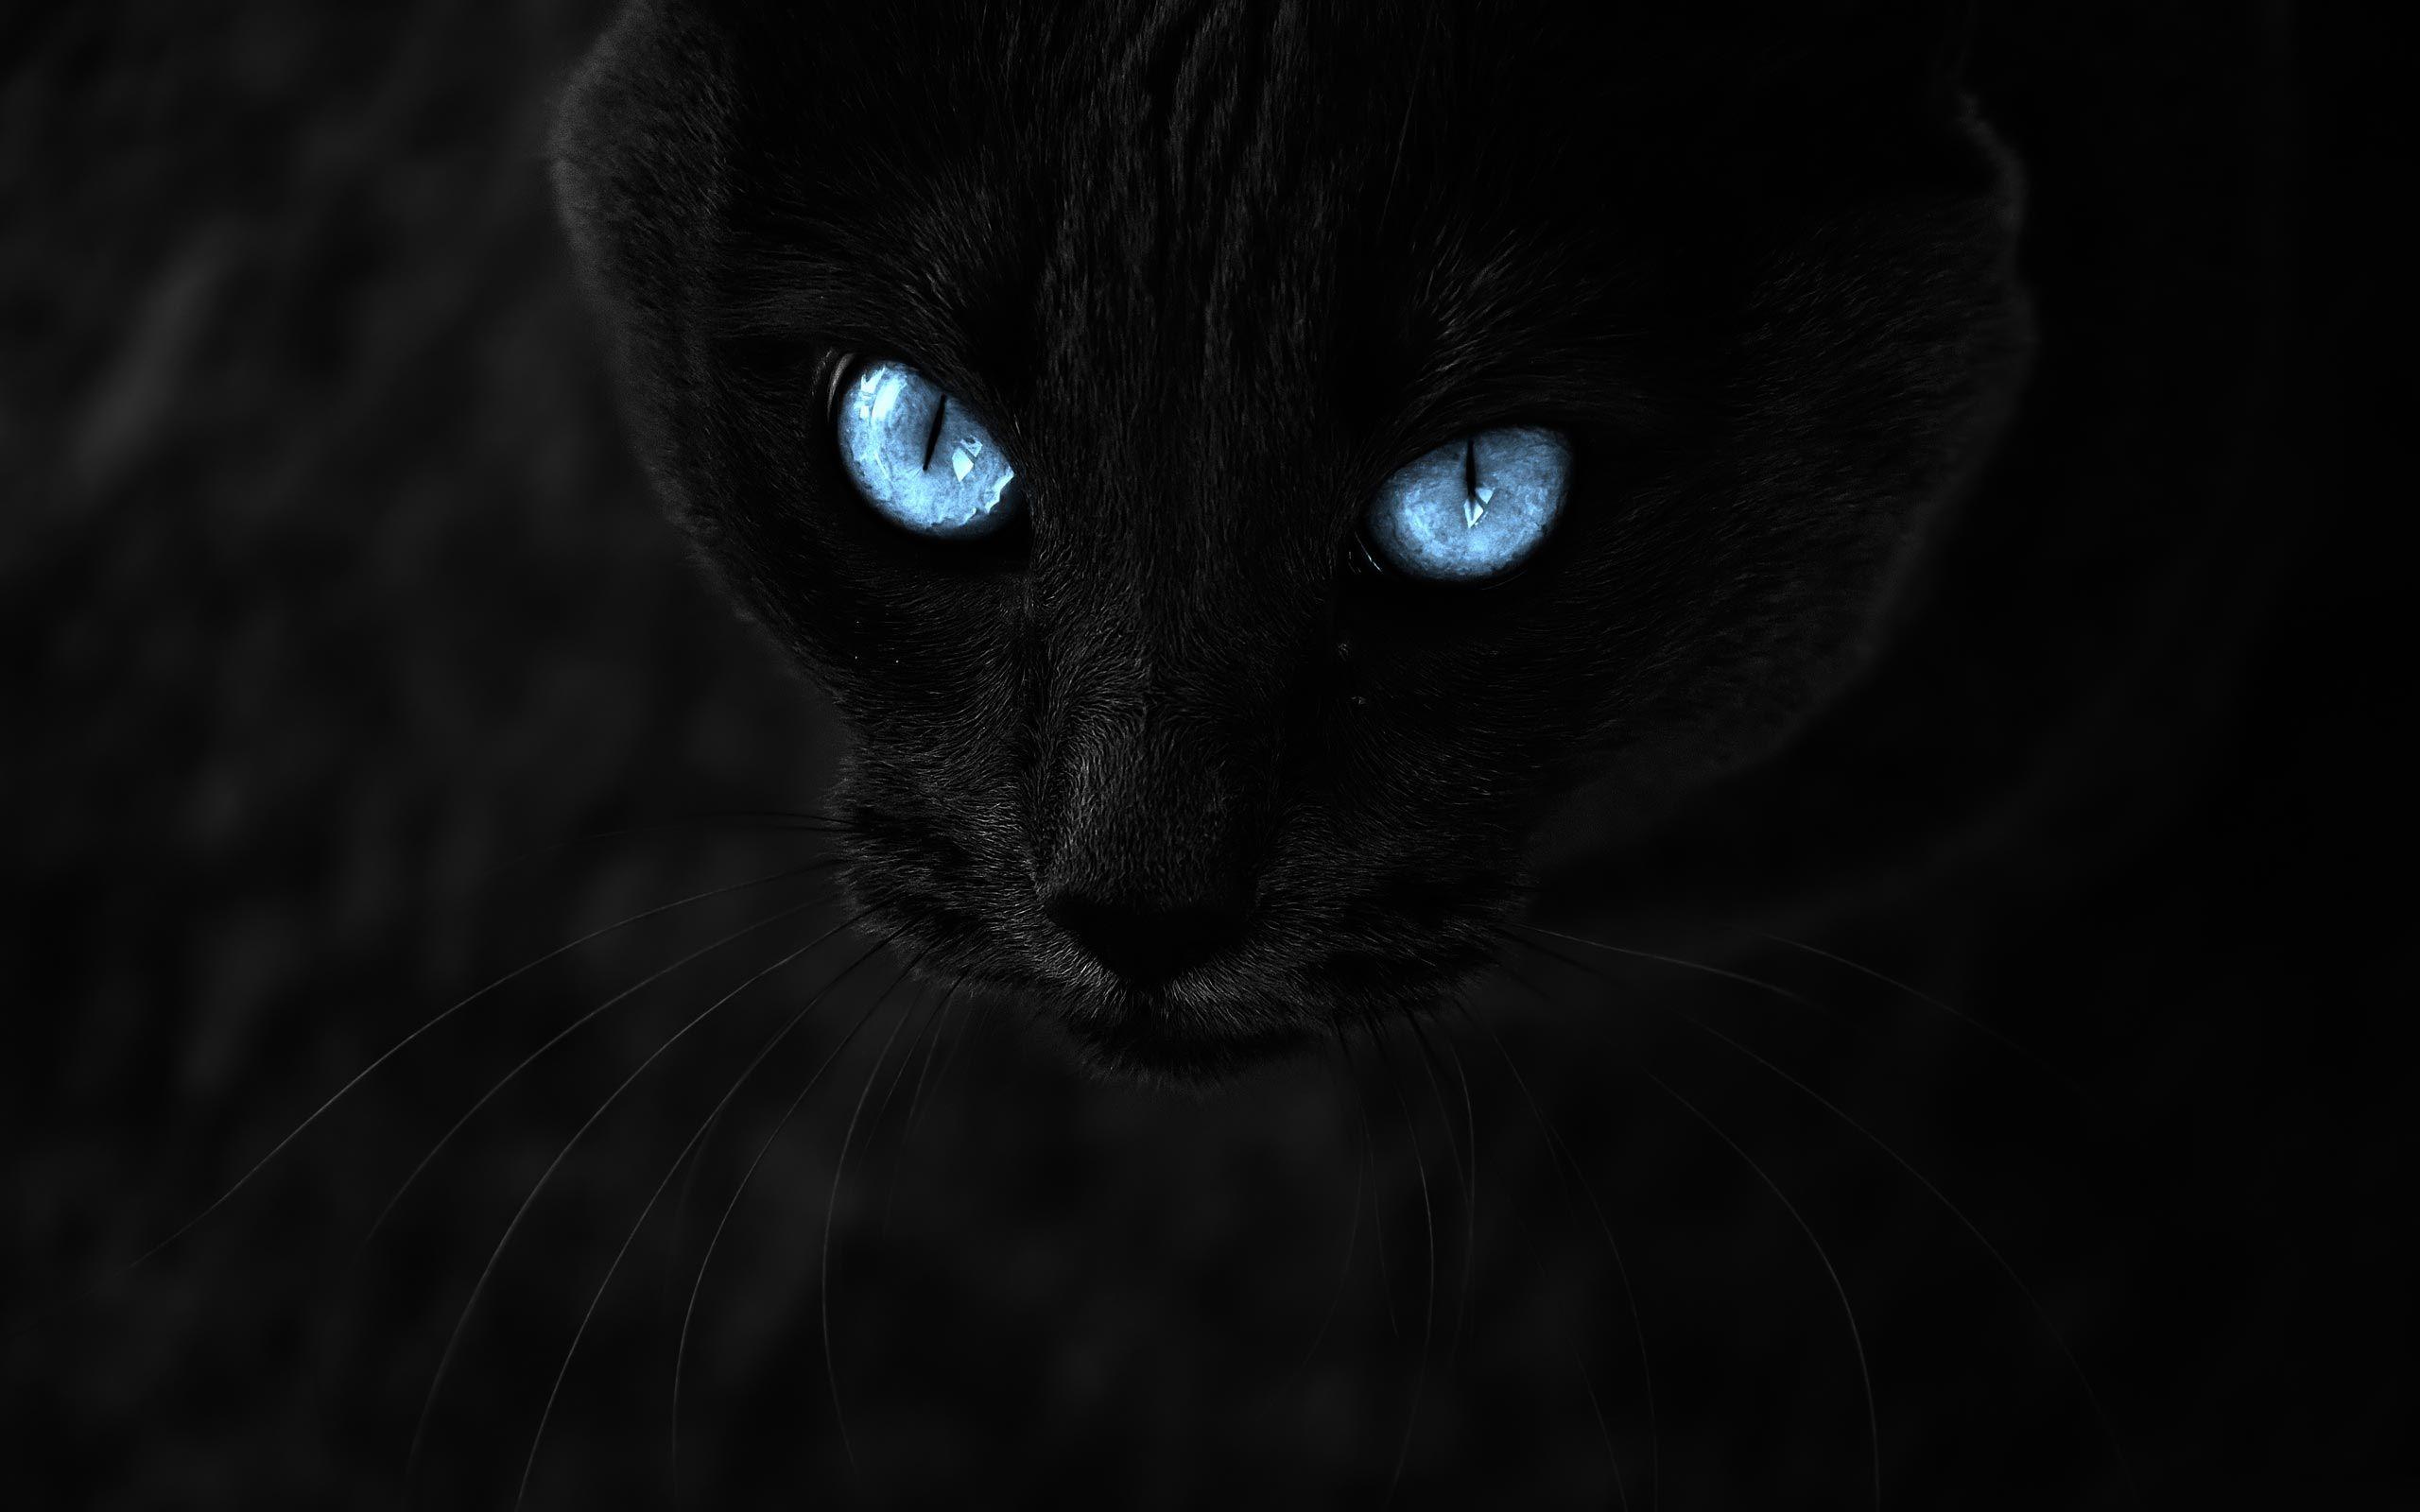 Animals Black Cat Blue Eyes Desktop Wallpapers And Backgrounds Cat With Blue Eyes Cat Wallpaper Black Cat